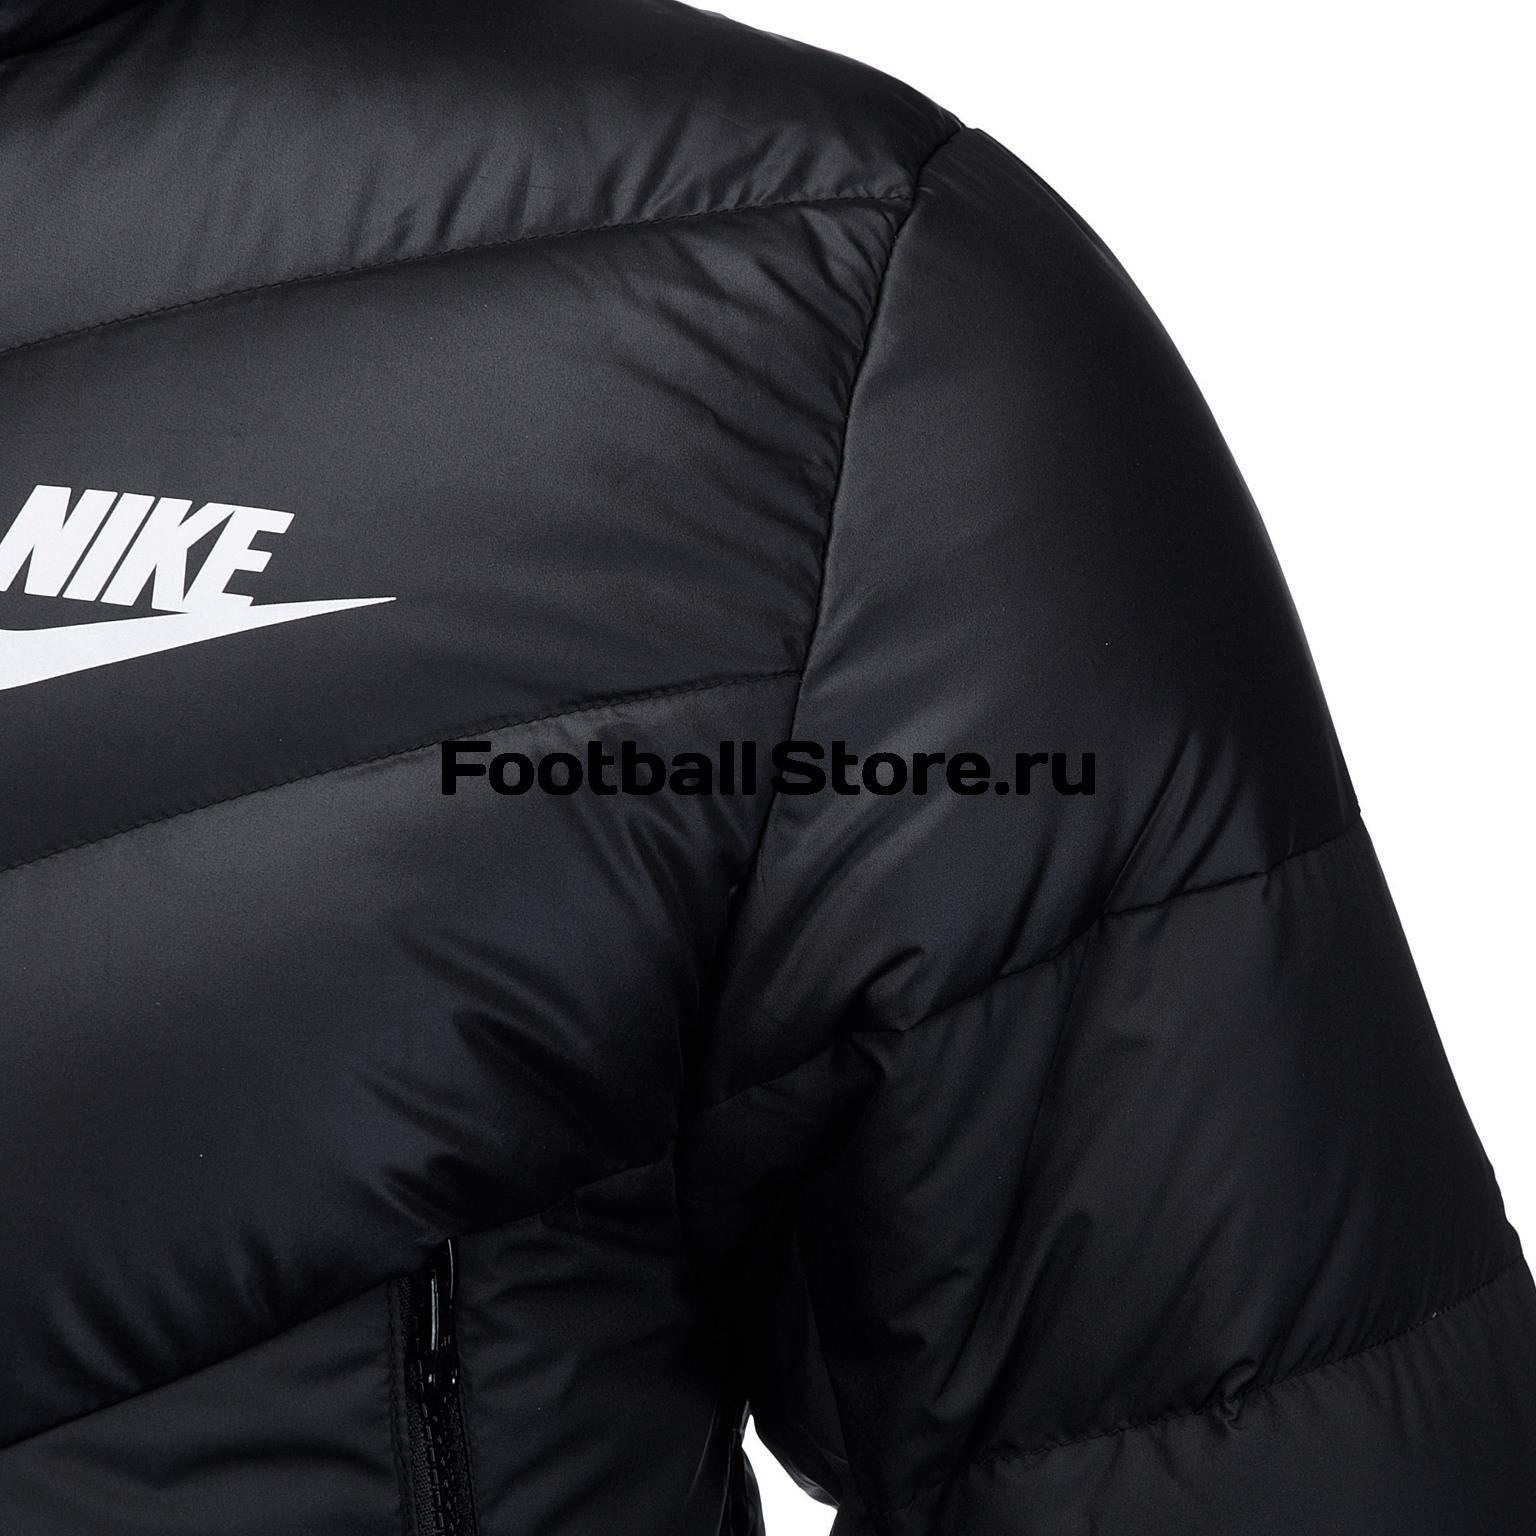 95a1b34a Куртка утепленная Nike Down Fill JKT 928833-010 – купить в интернет ...